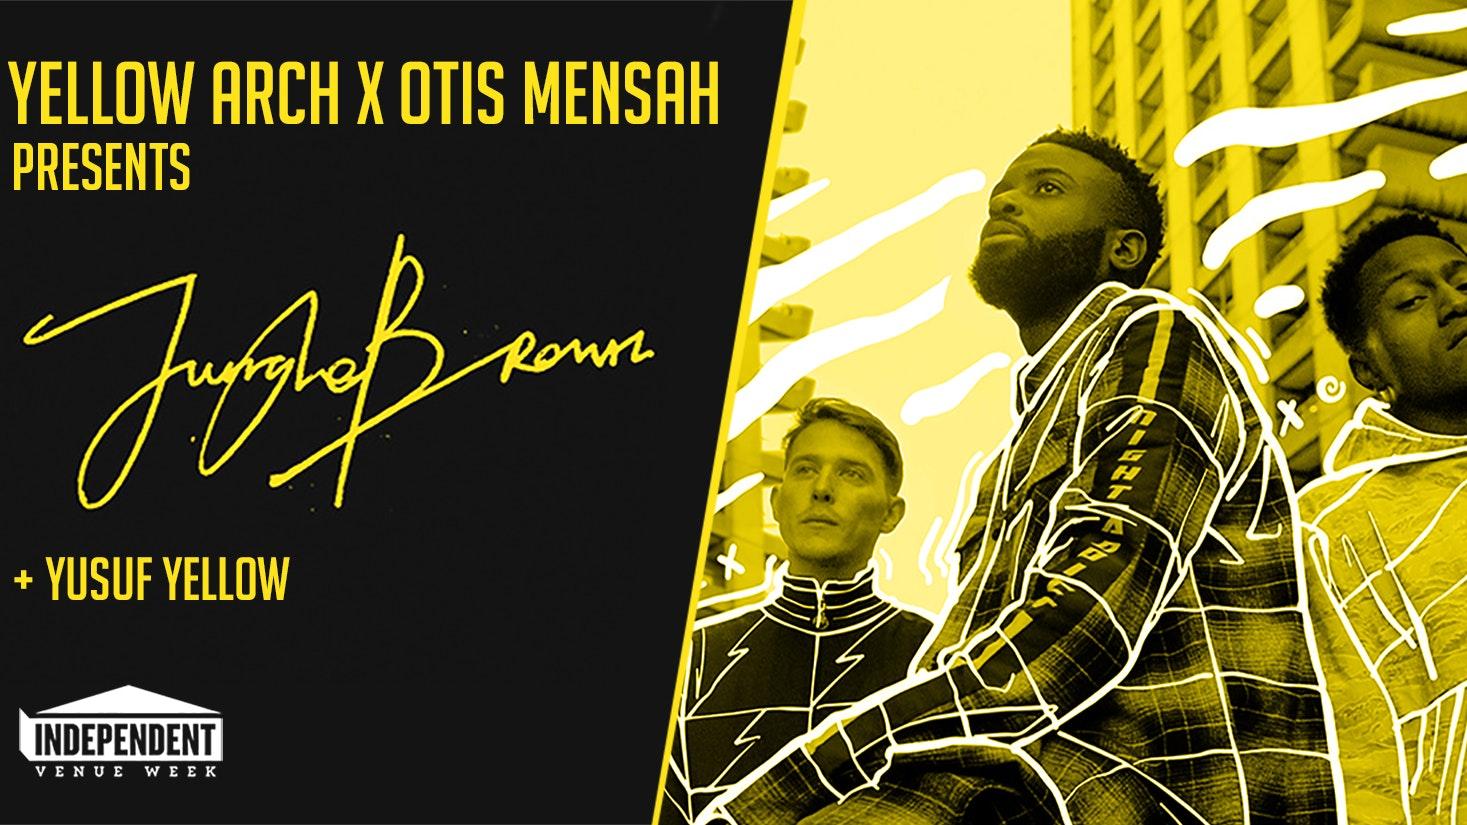 Otis Mensah x Yellow Arch pres. Jungle Brown